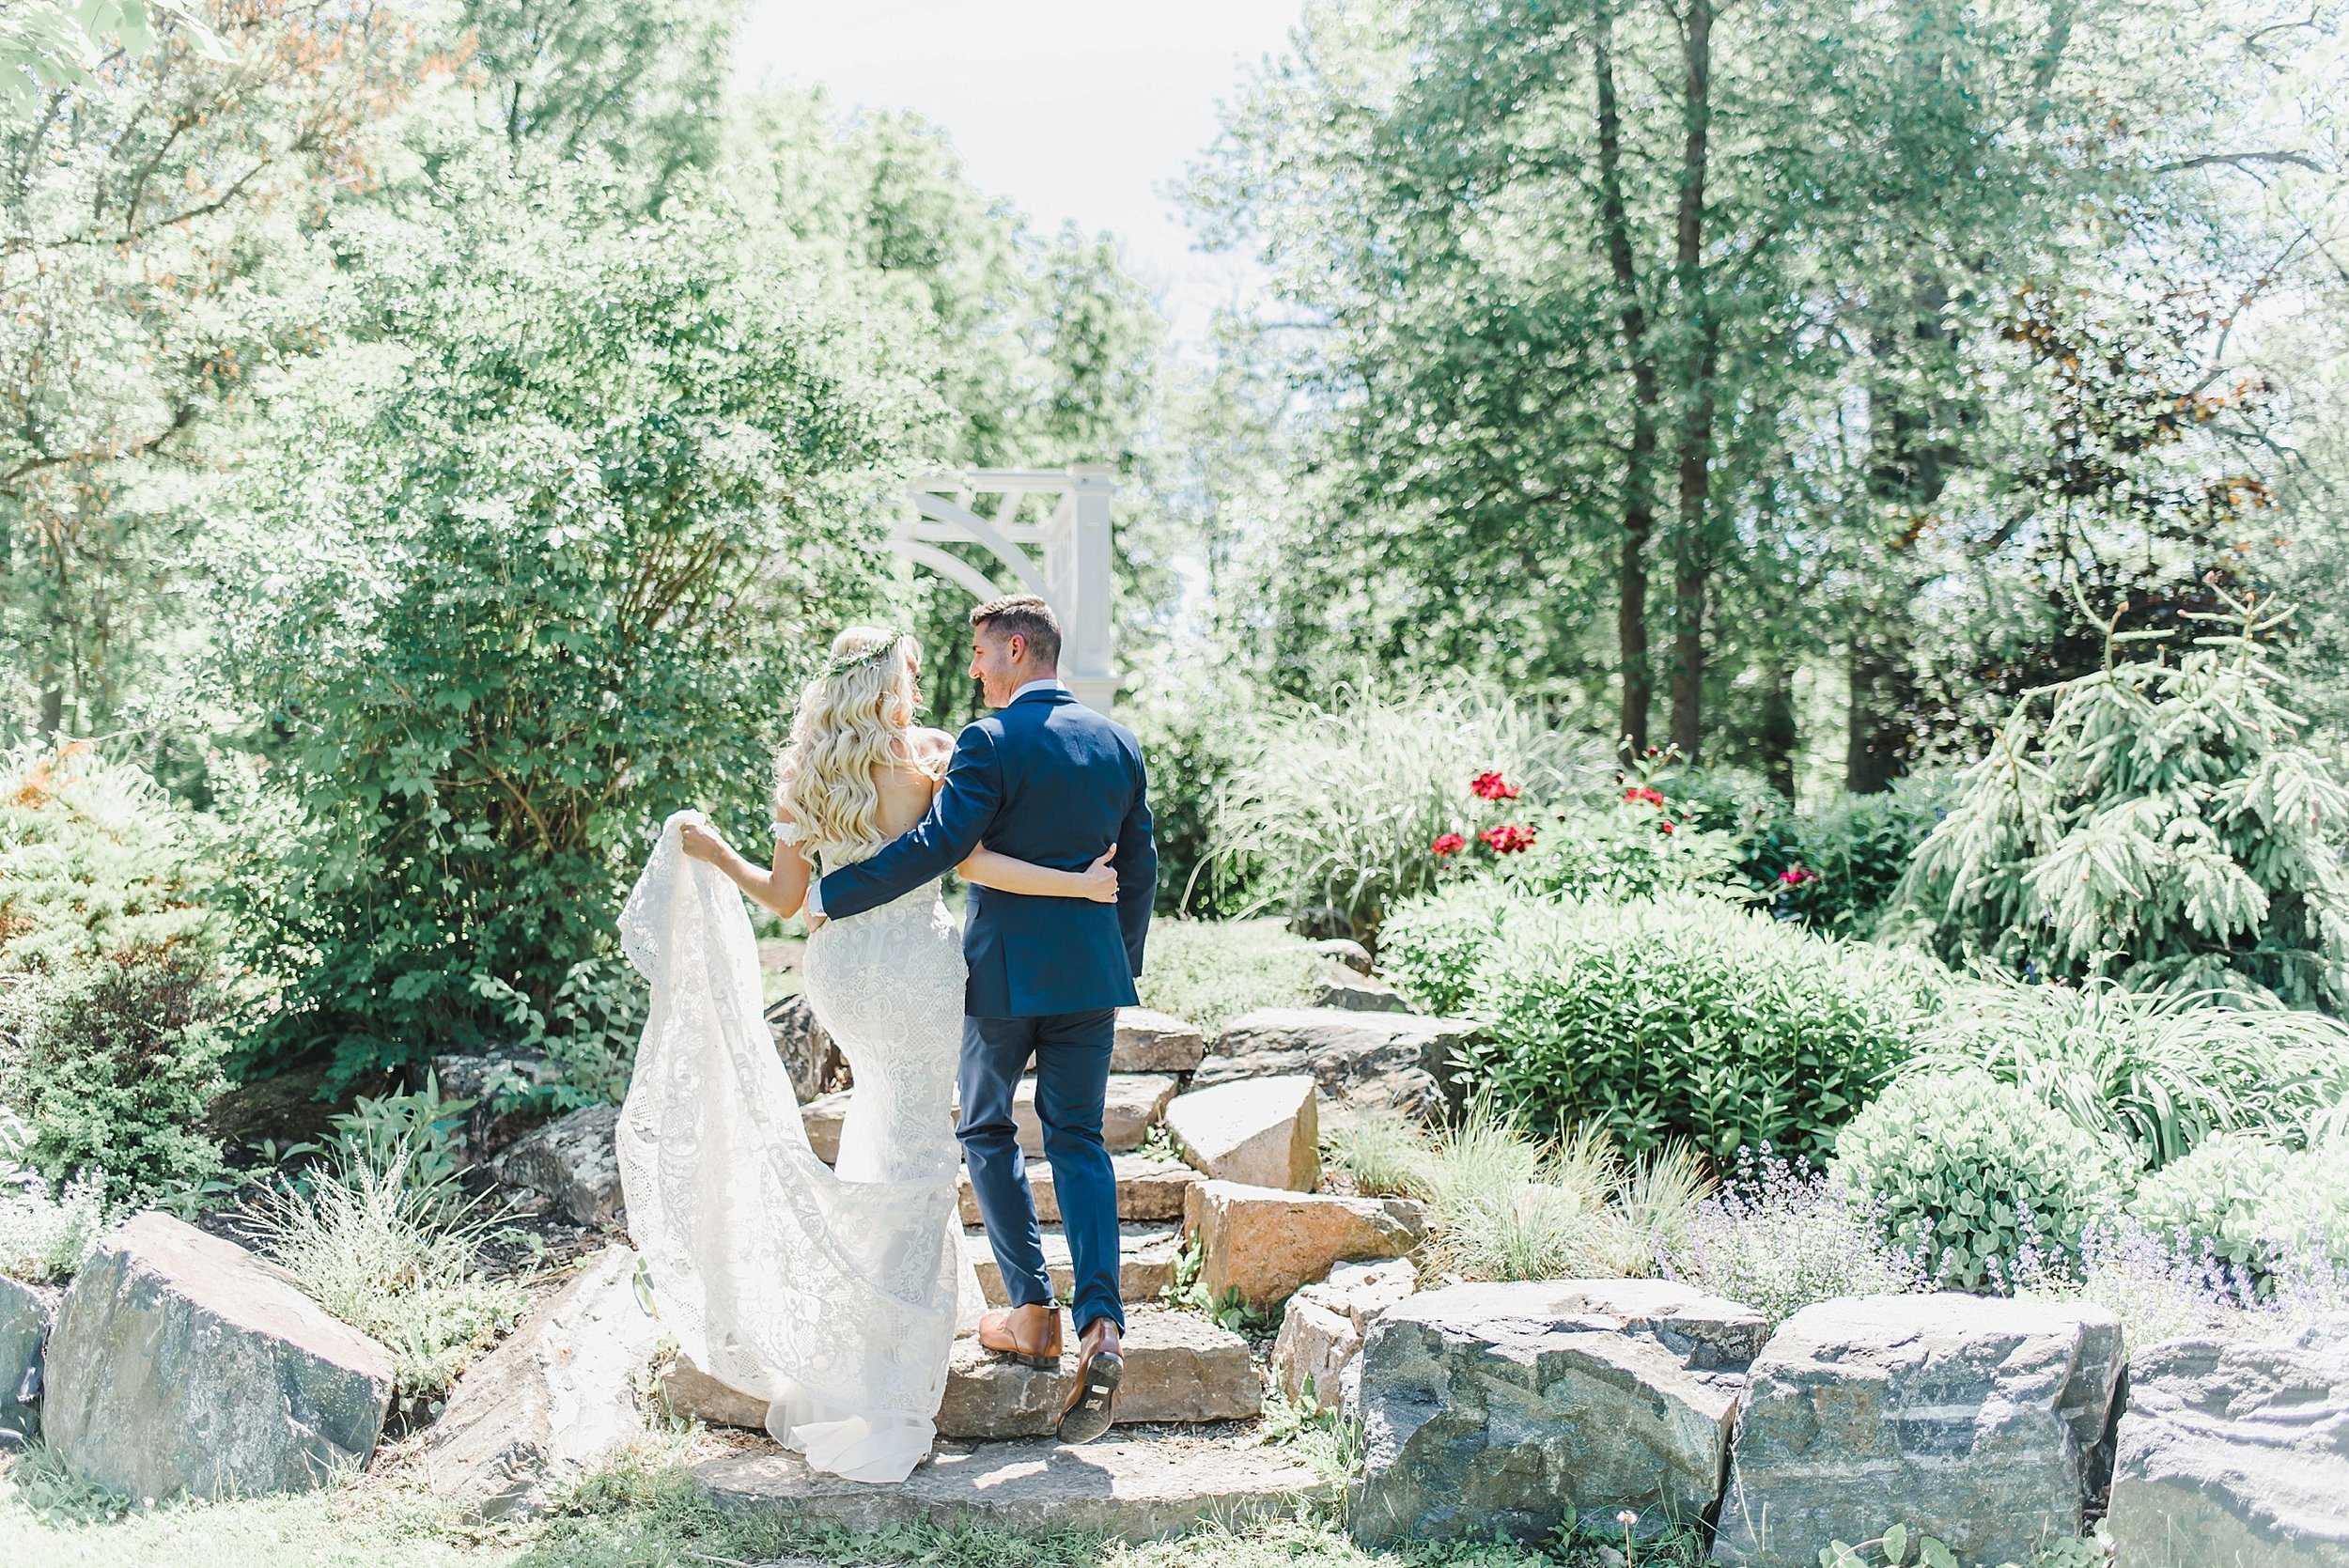 light airy indie fine art ottawa wedding photographer | Ali and Batoul Photography_0041.jpg